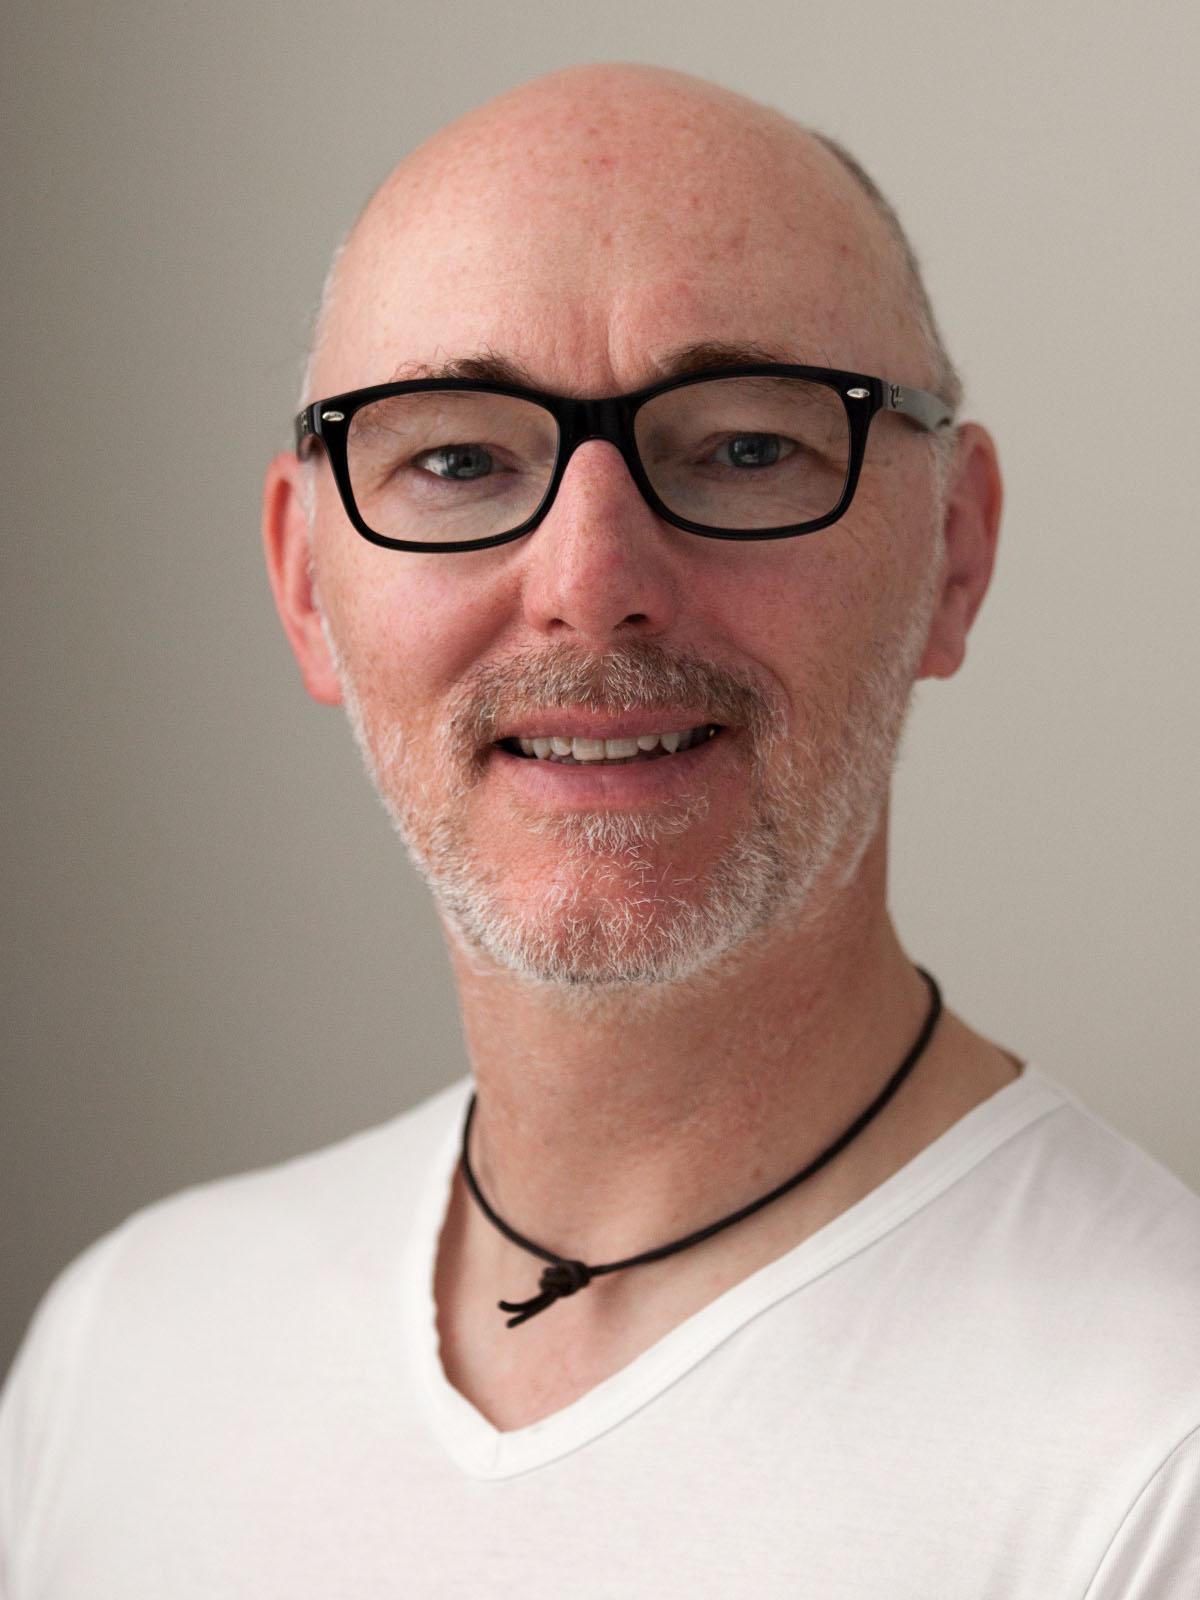 Bernhard Gösswein